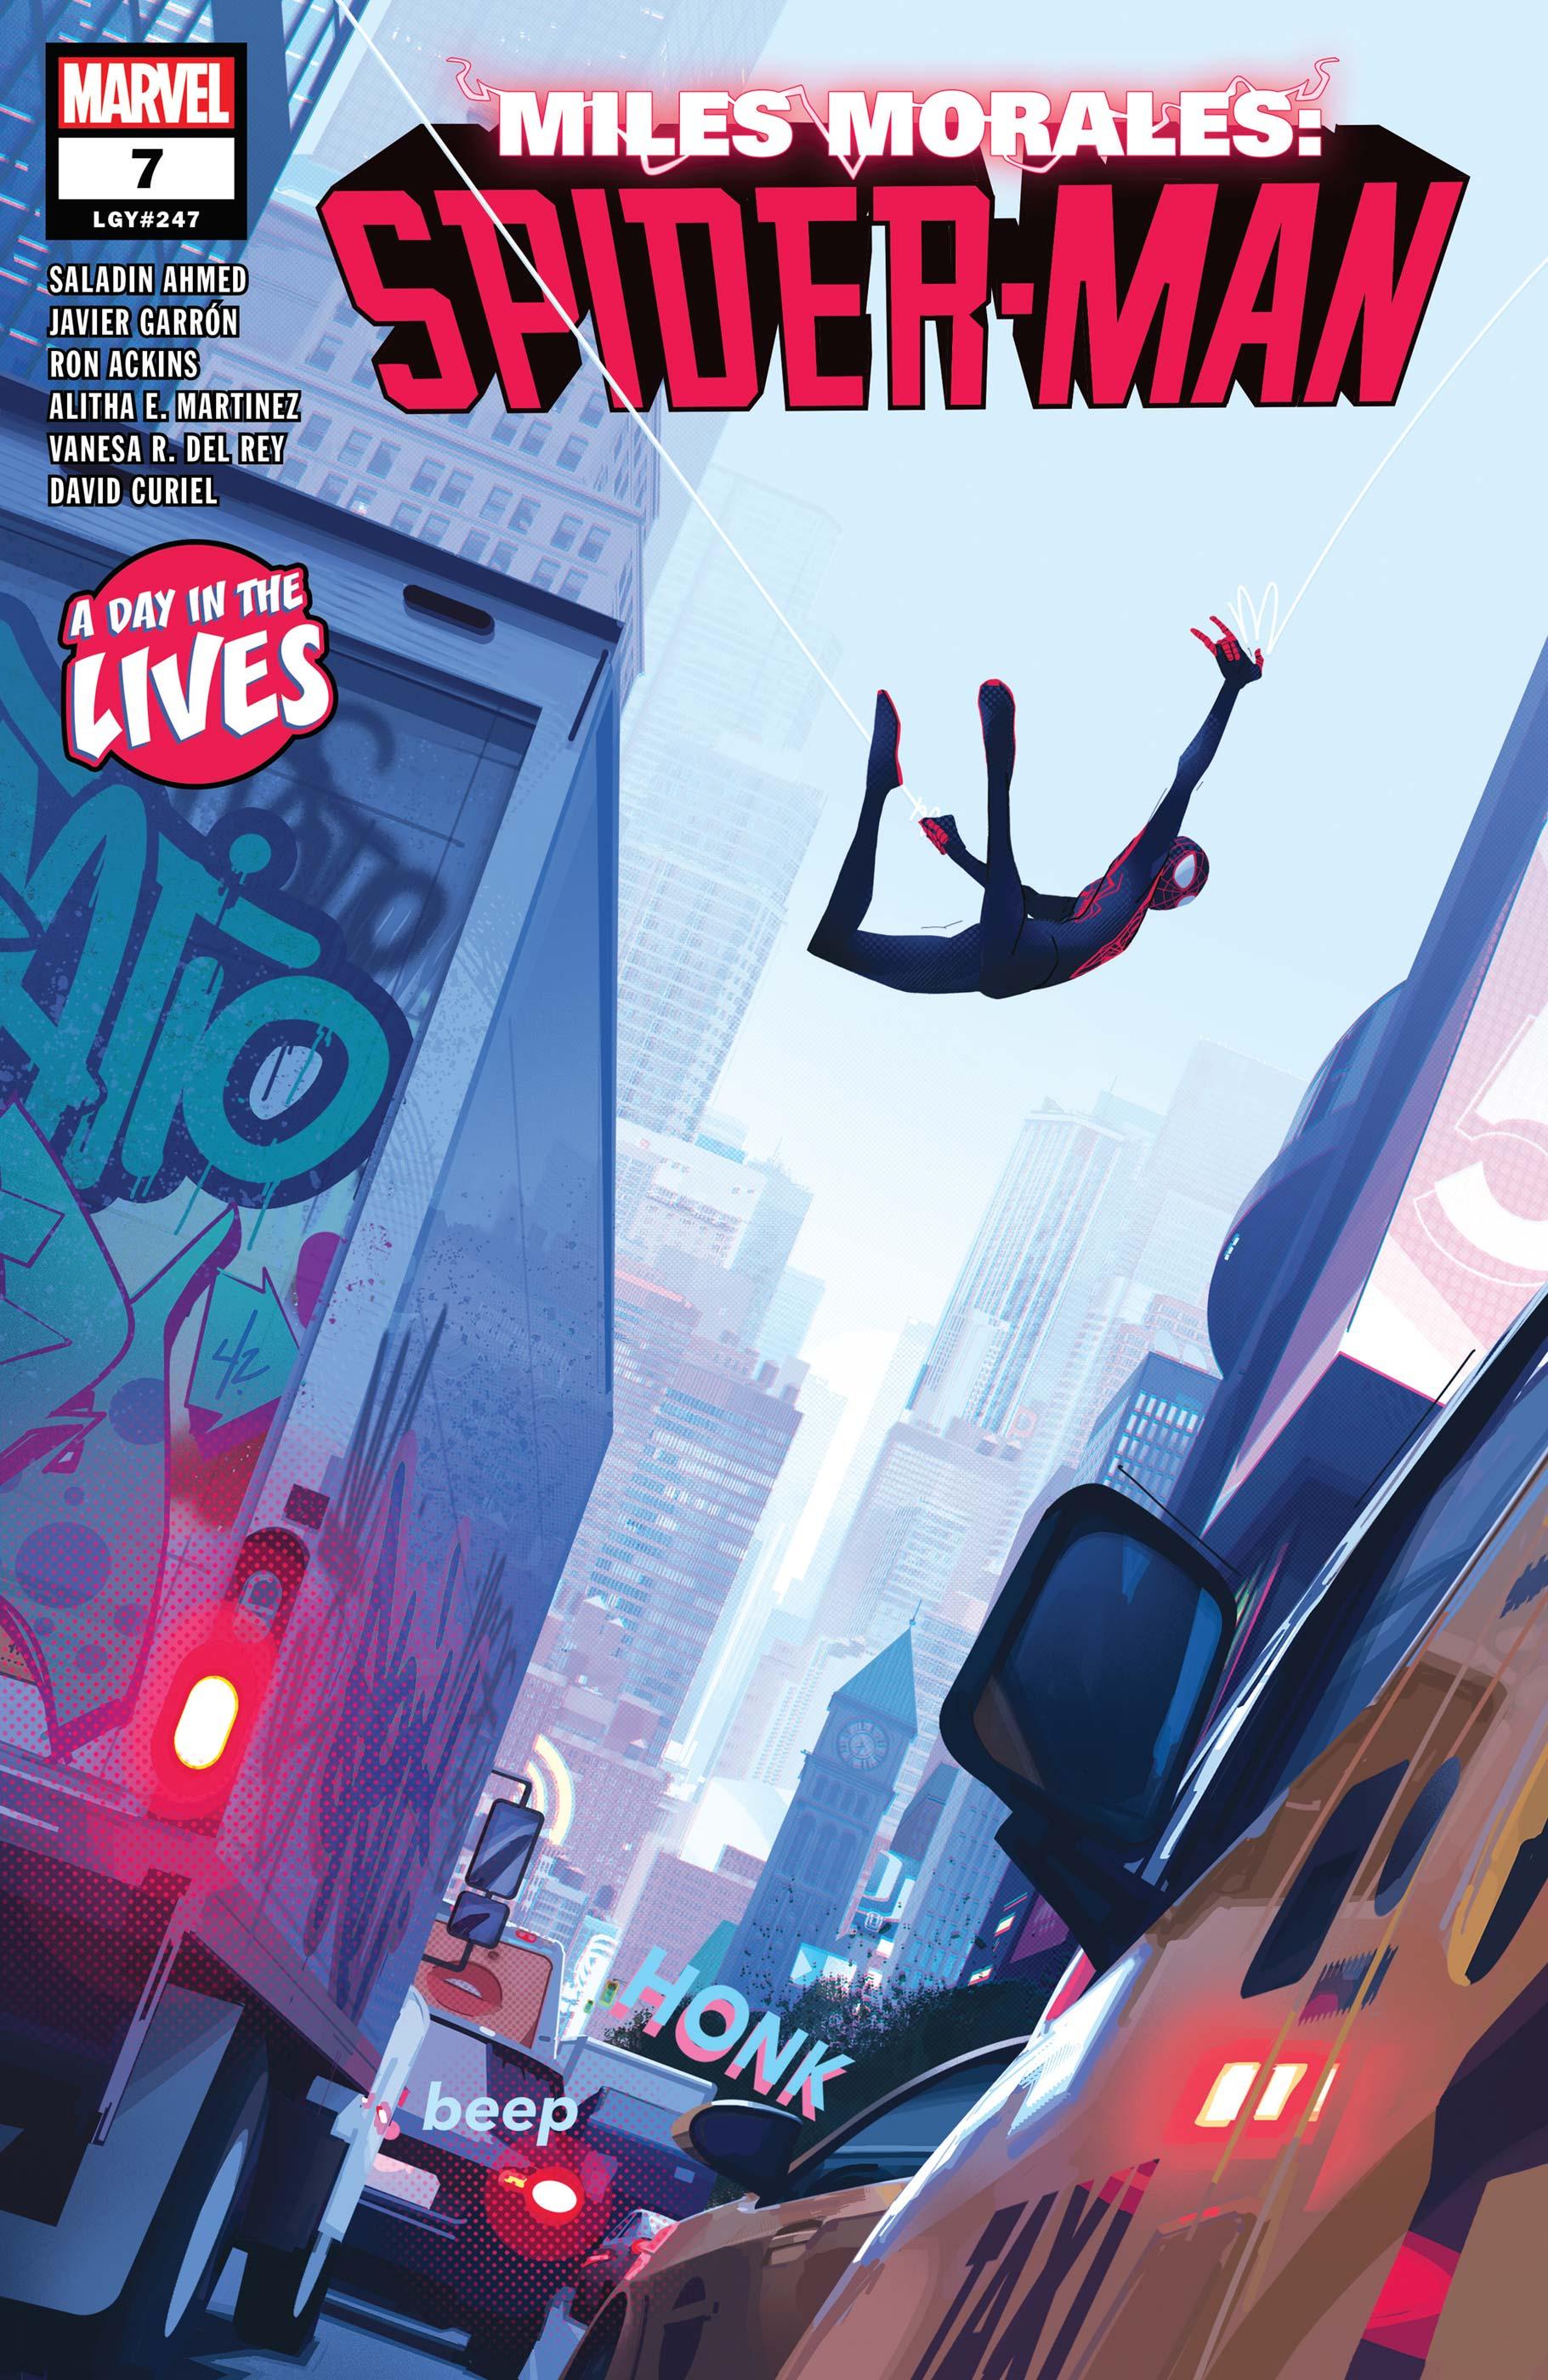 Miles Morales: Spider-Man (2018) #7